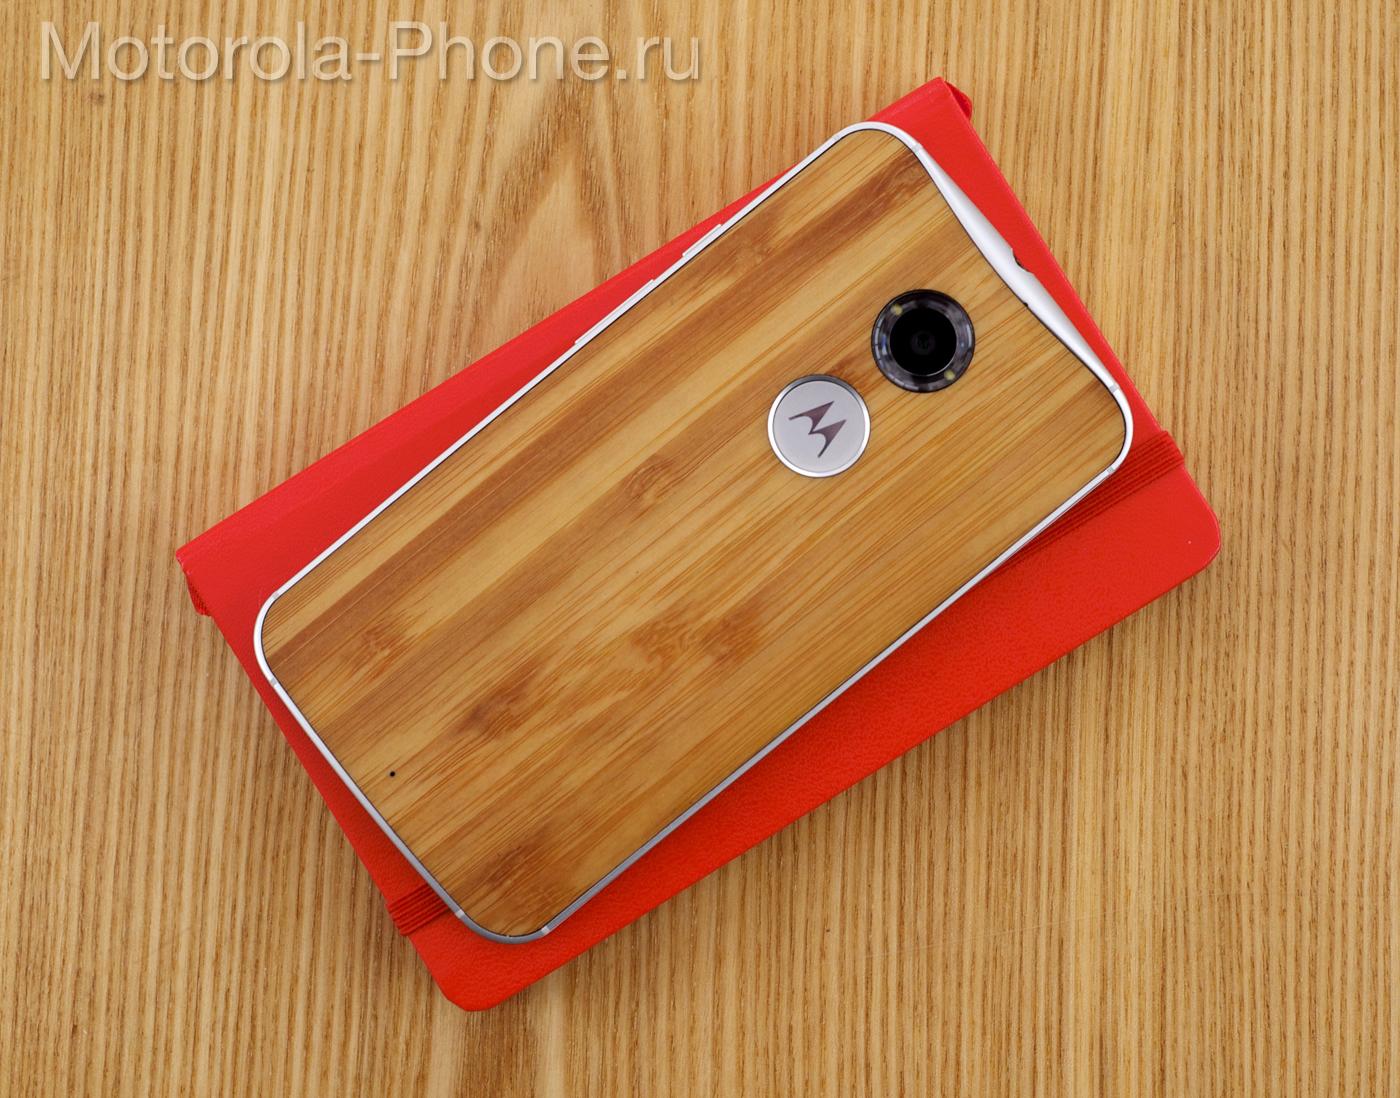 Motorola-Moto-X-review-17